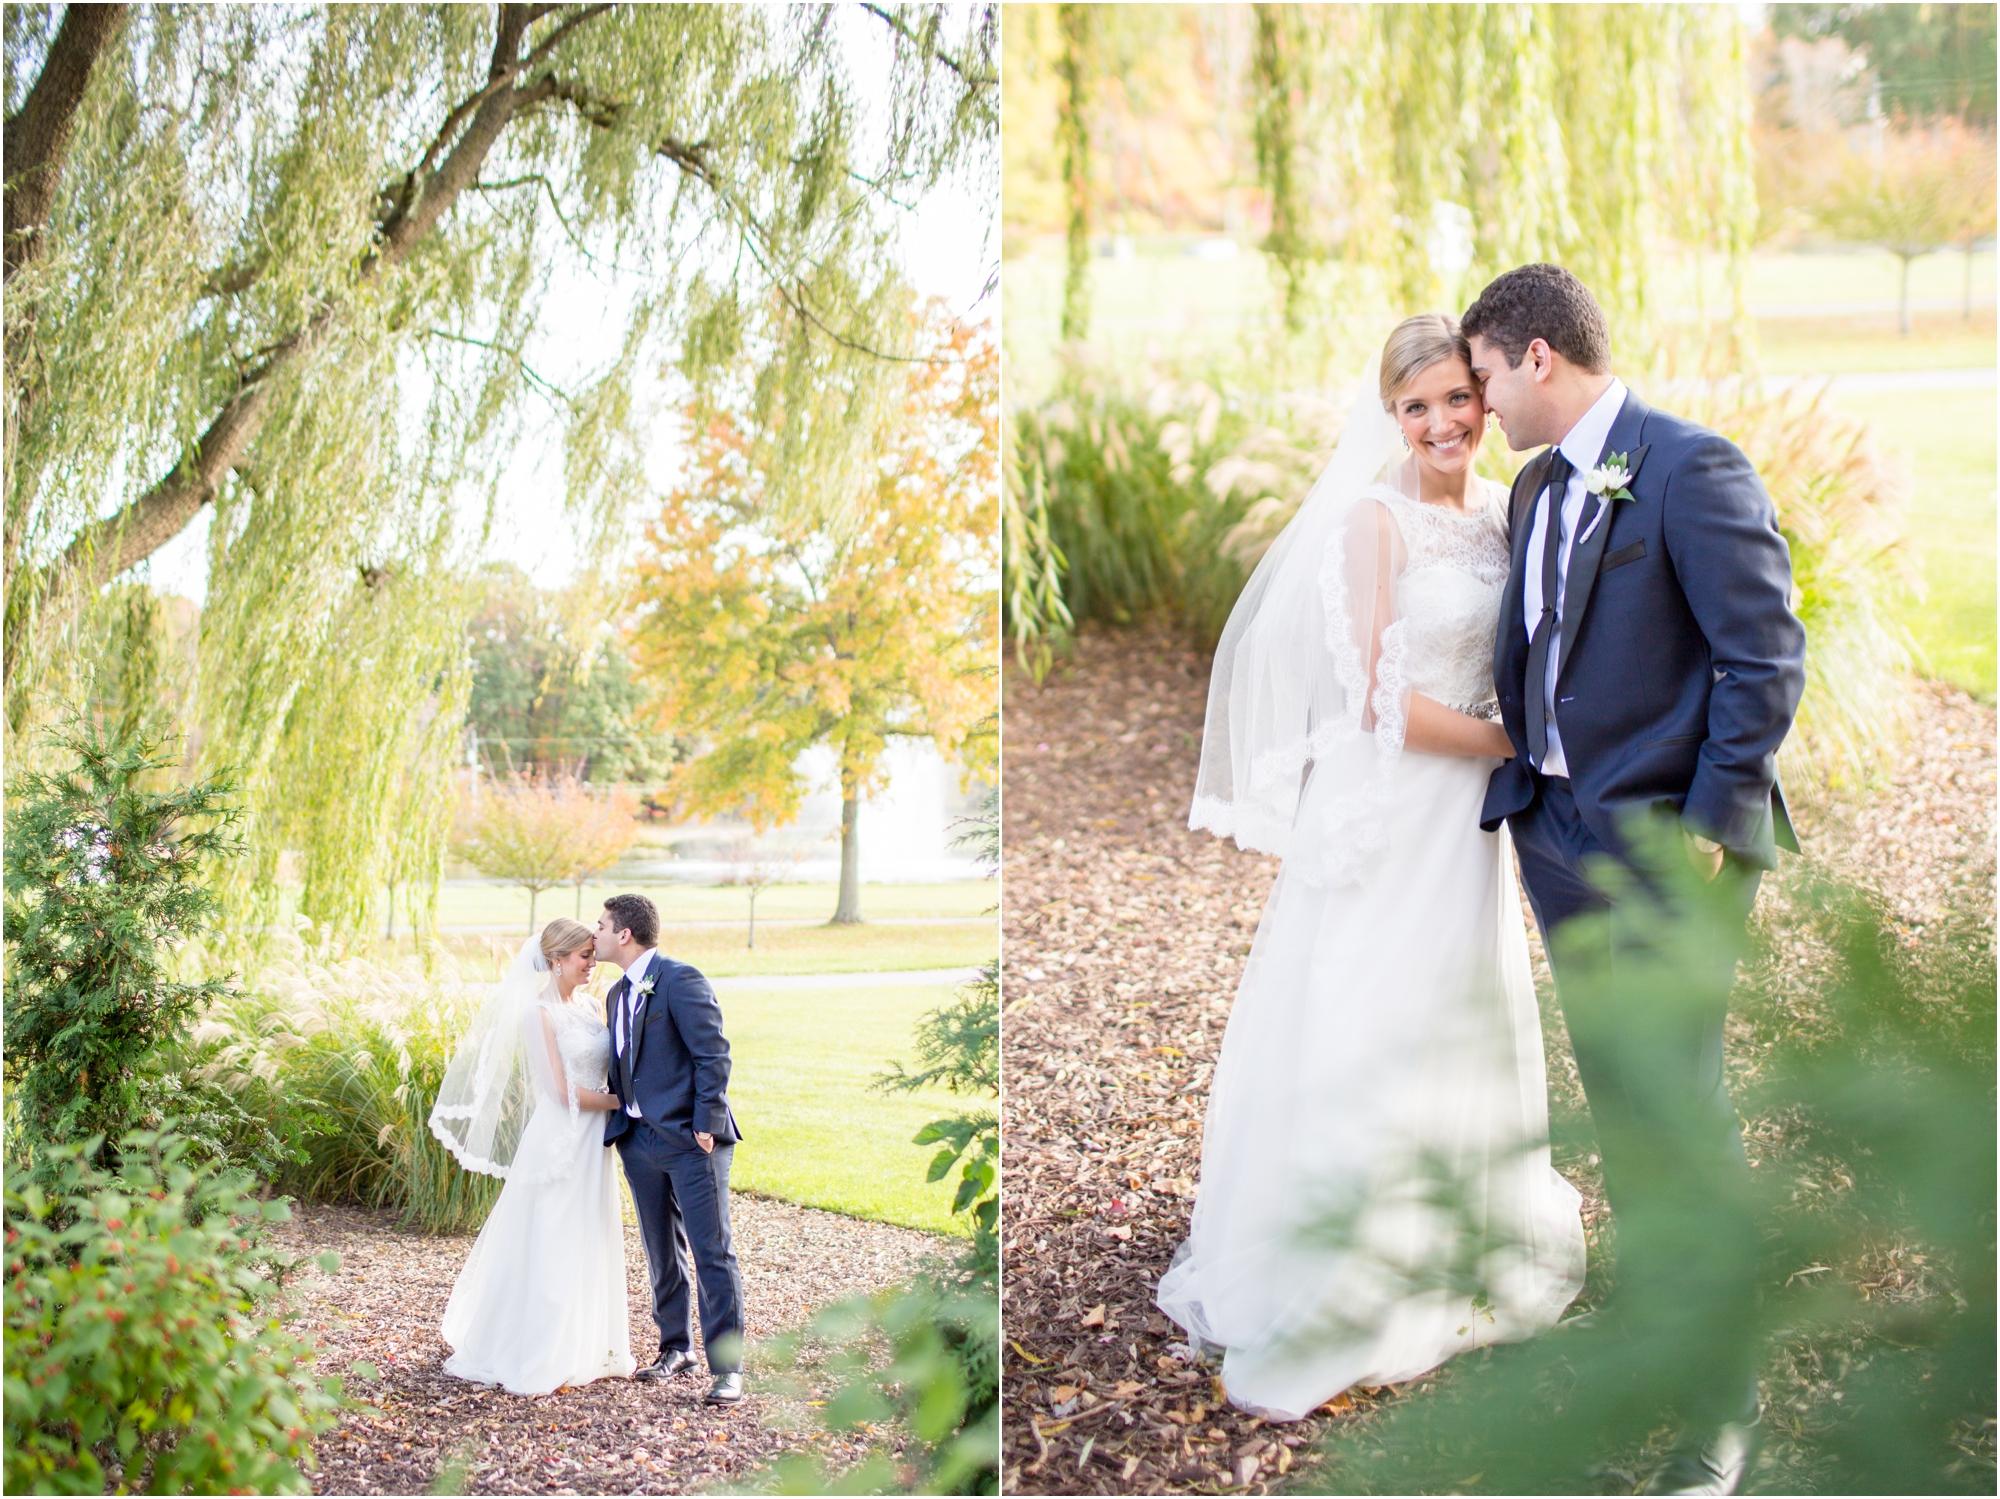 2-Finkel Wedding Bride & Groom Portraits-272_anna grace photography maryland wedding photographer turf valley.jpg